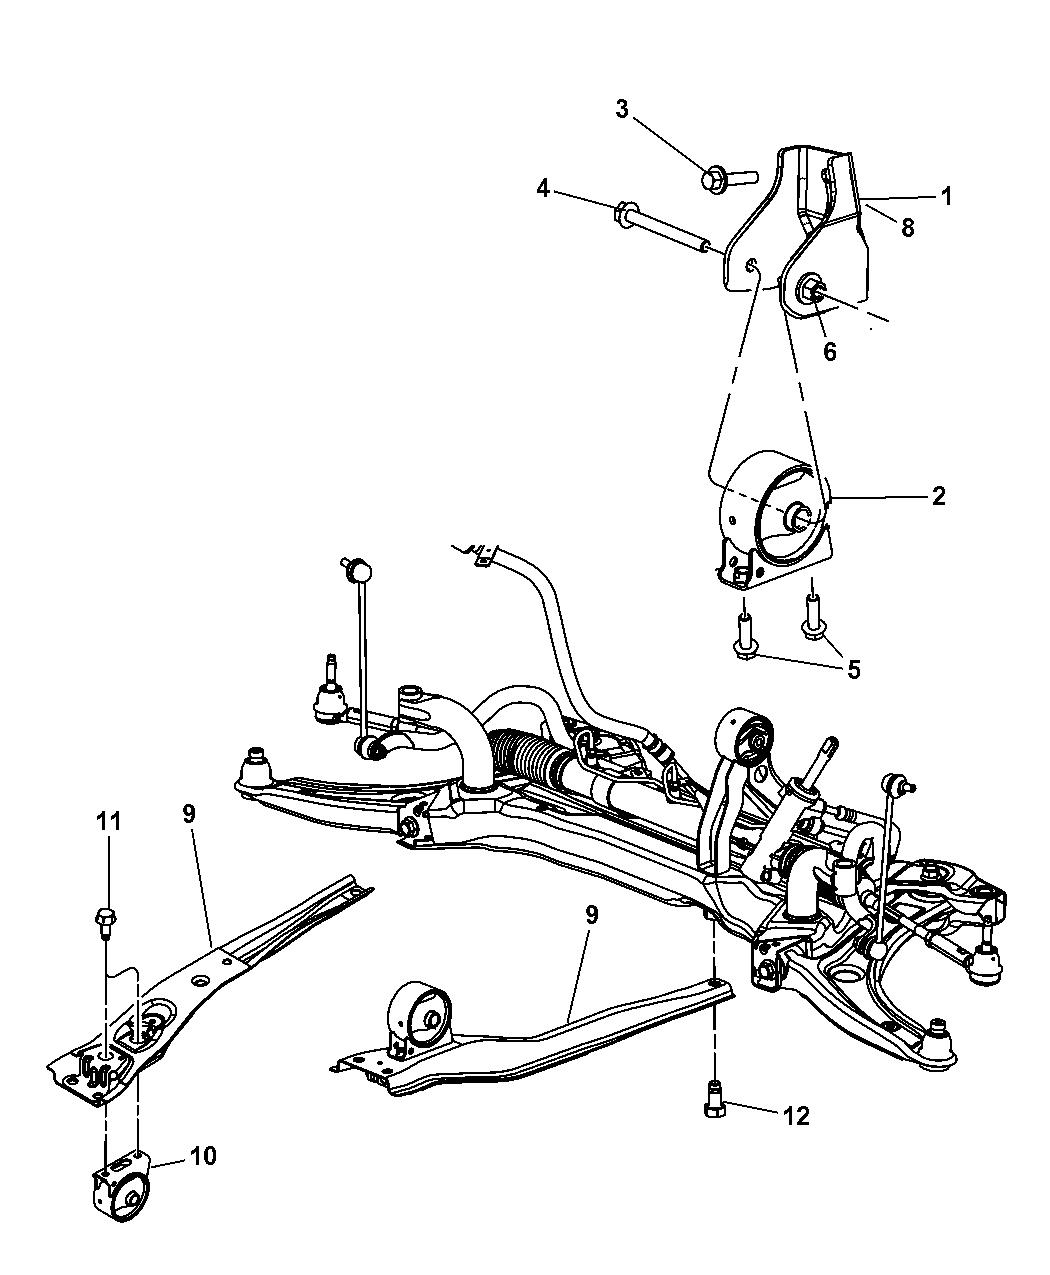 5105416ad Genuine Mopar Bracket Torque Reaction Jeep Patriot Engine Diagram 2007 Support Front